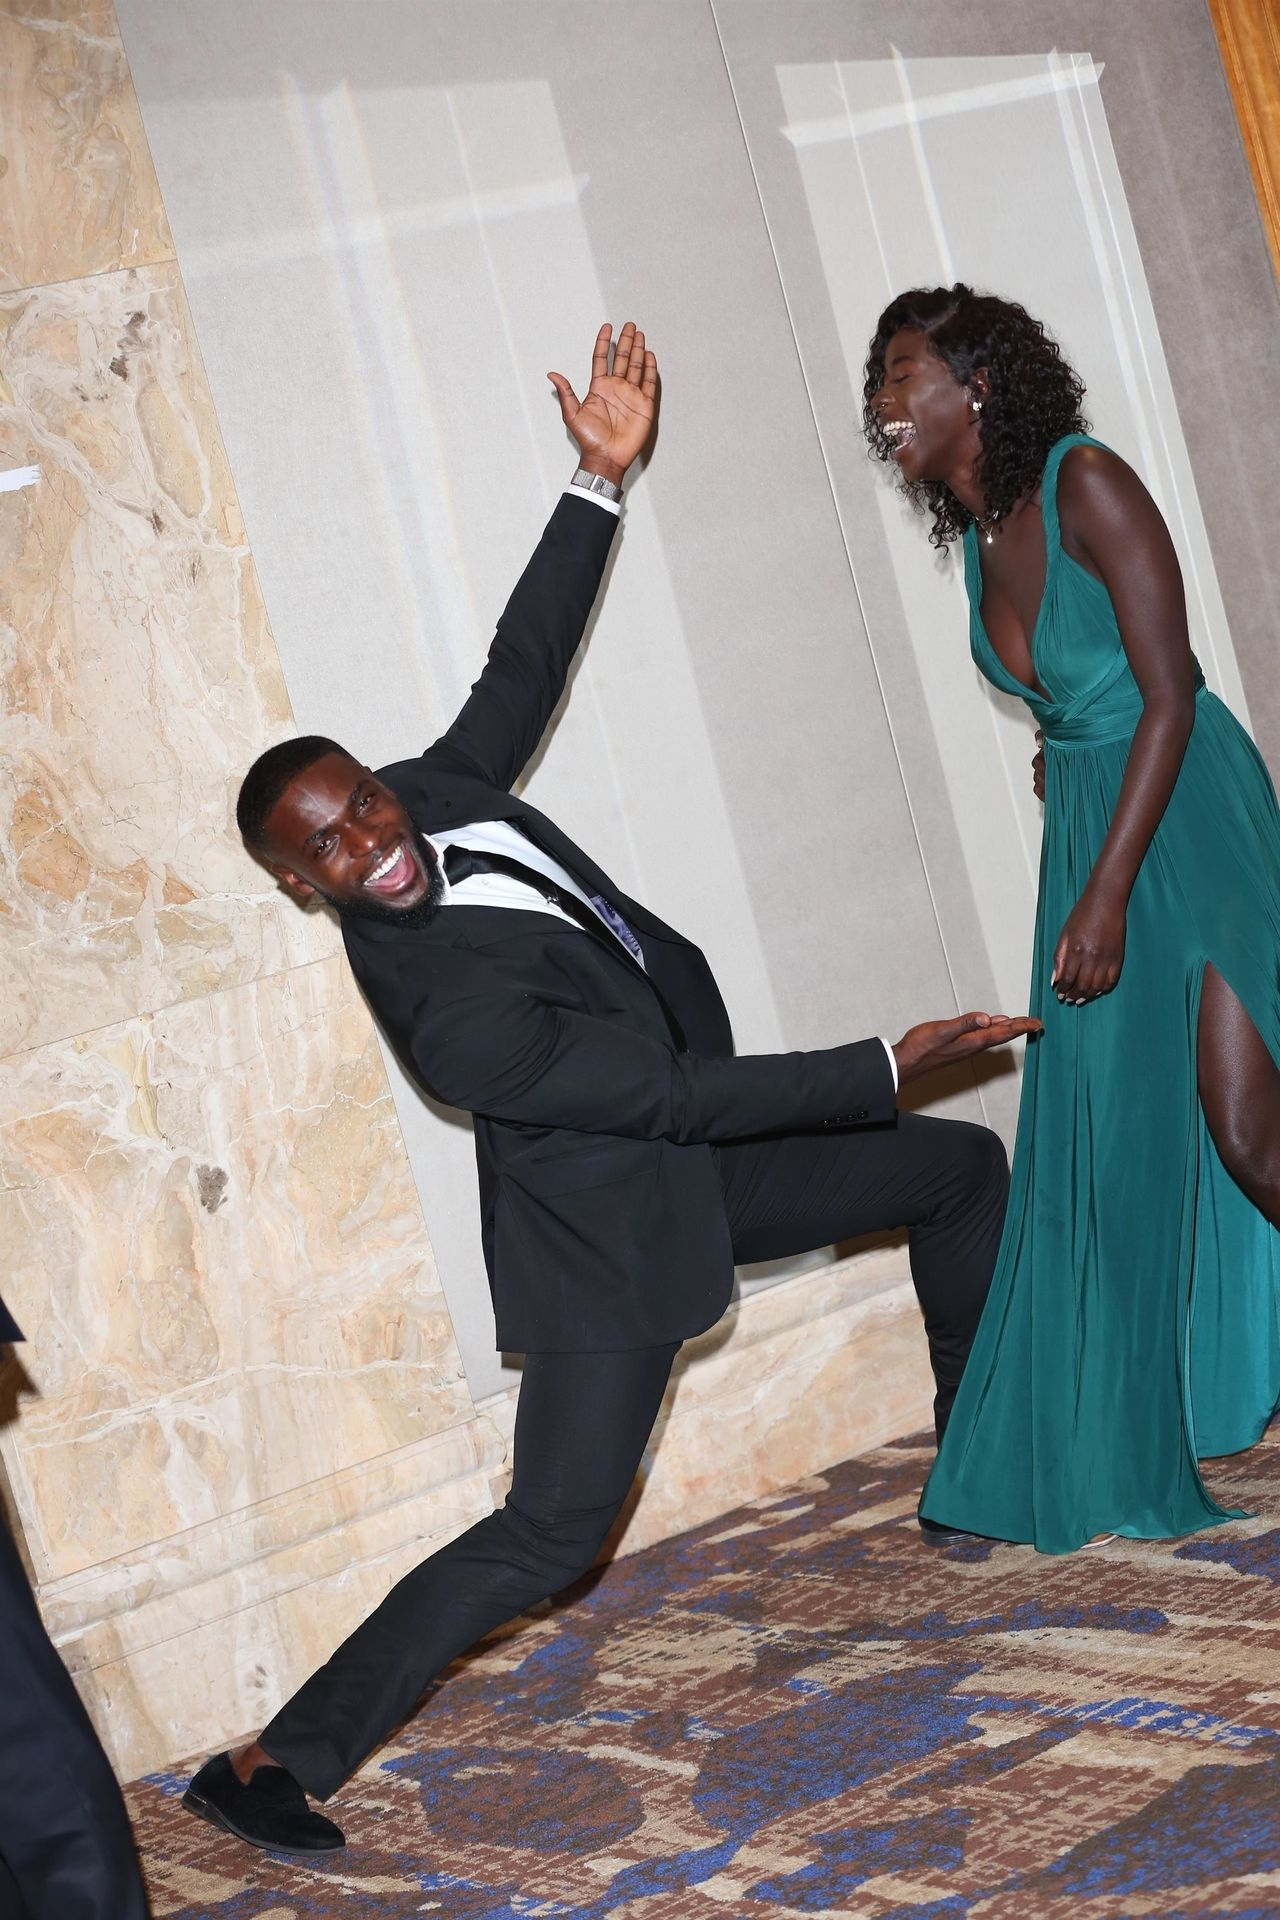 Mike Boateng & Priscilla Anyabu Are Seen At British Ethnic Diversity Sports Awards 0145